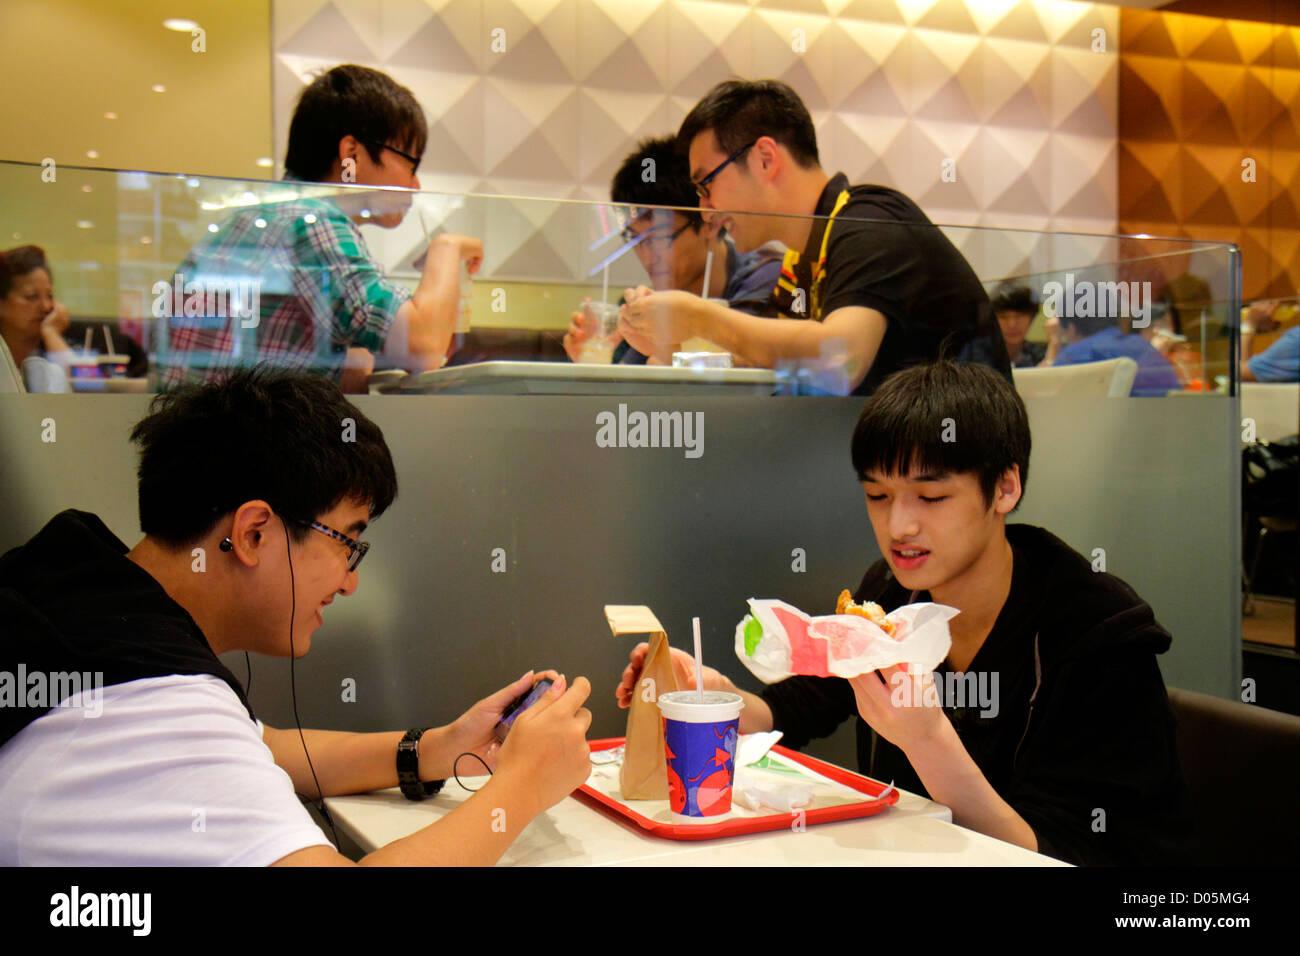 Shanghai China Huangpu District Xizang Road People's Square Raffles City shopping Asian teen boy eating US company - Stock Image